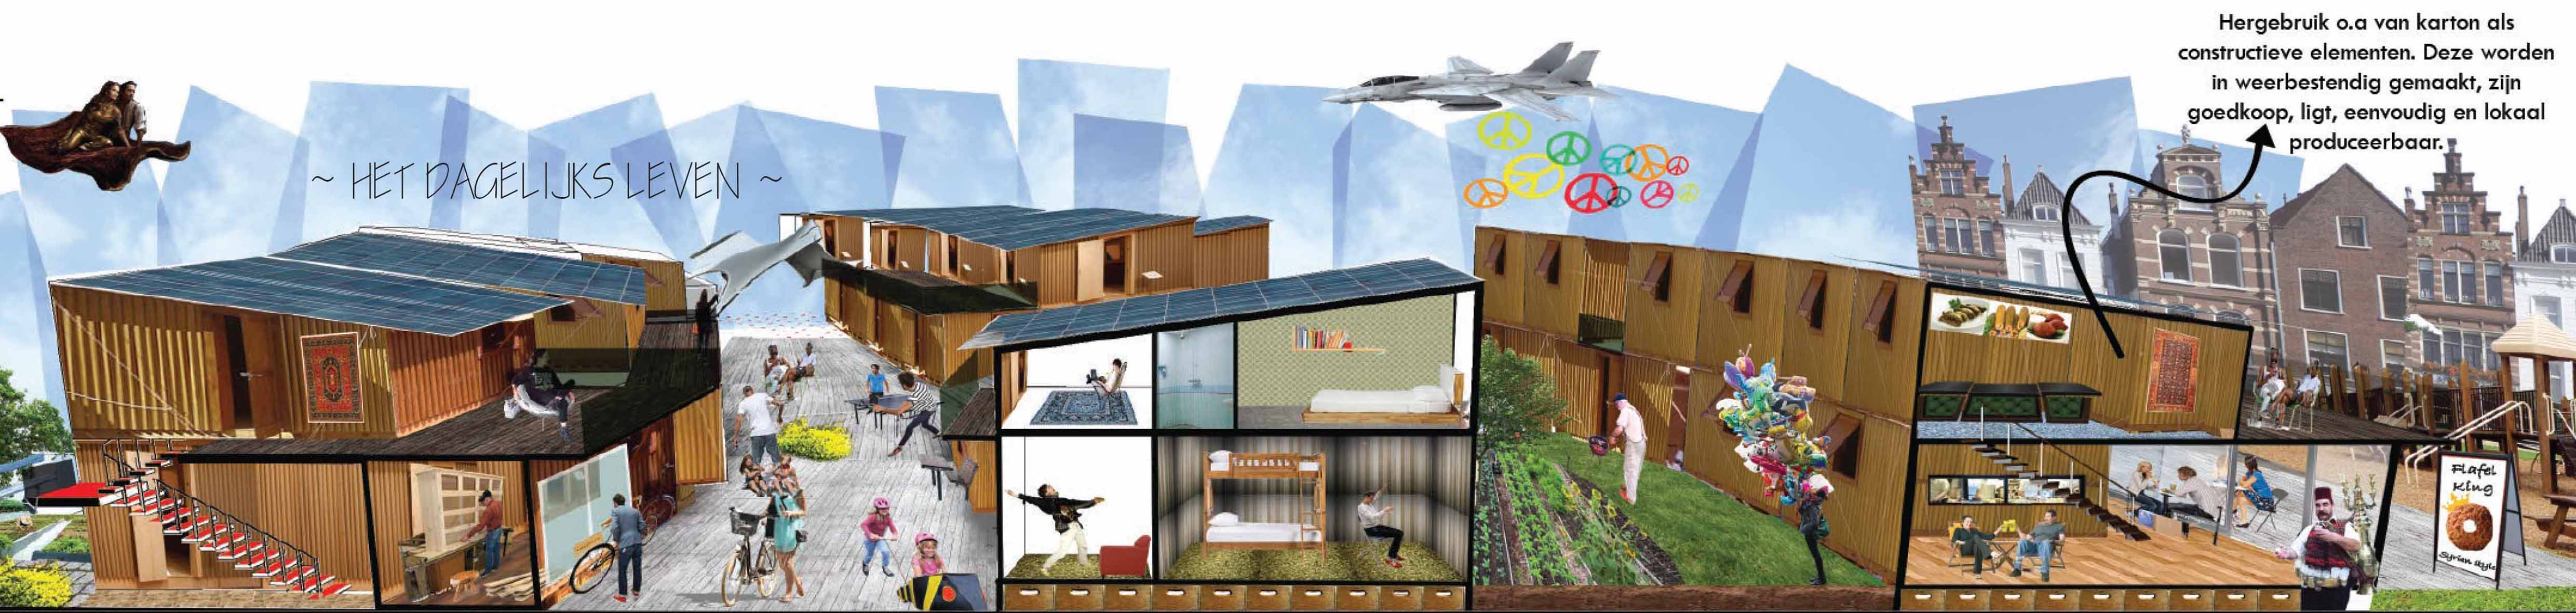 Sociale architectuur